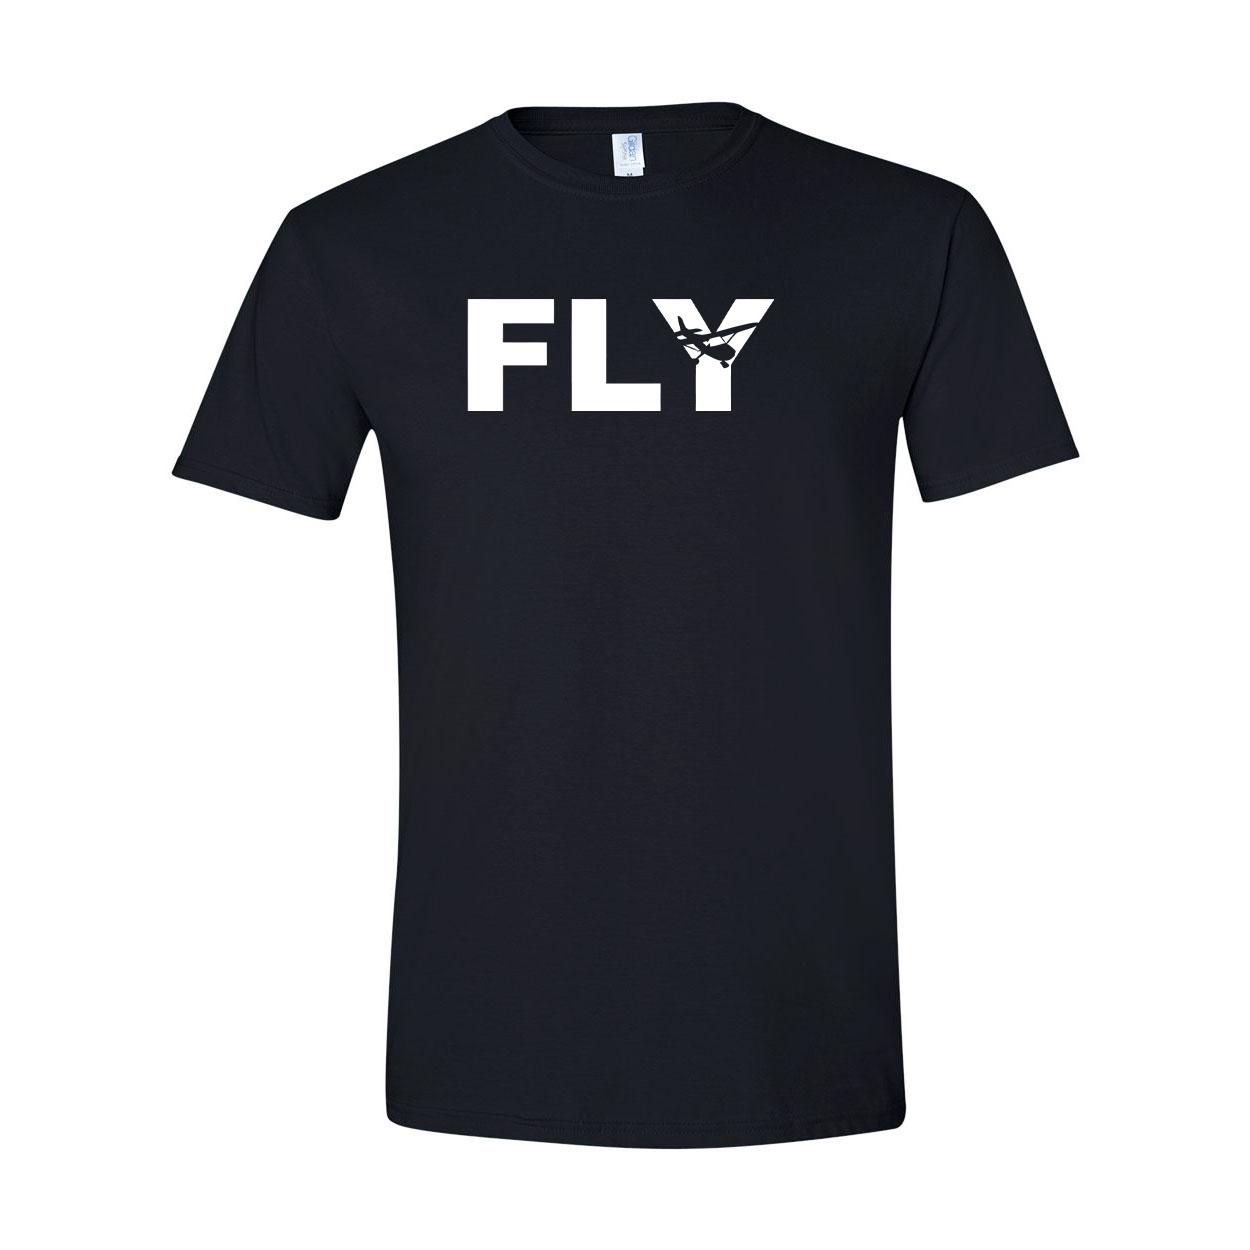 Fly Airplane Logo Classic T-Shirt Black (White Logo)